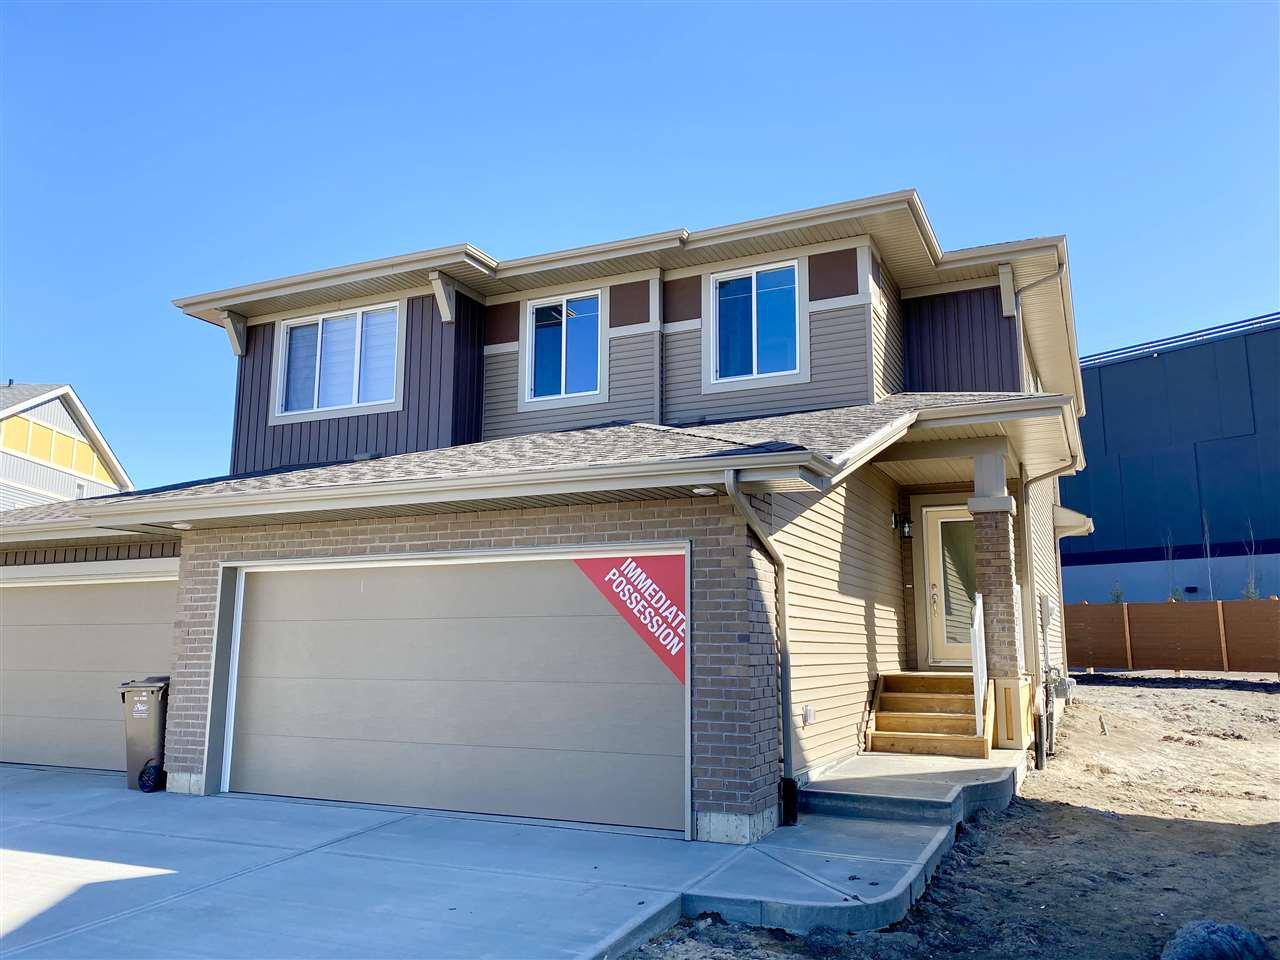 Main Photo: 38 JUNEAU Way: St. Albert House Half Duplex for sale : MLS®# E4196049